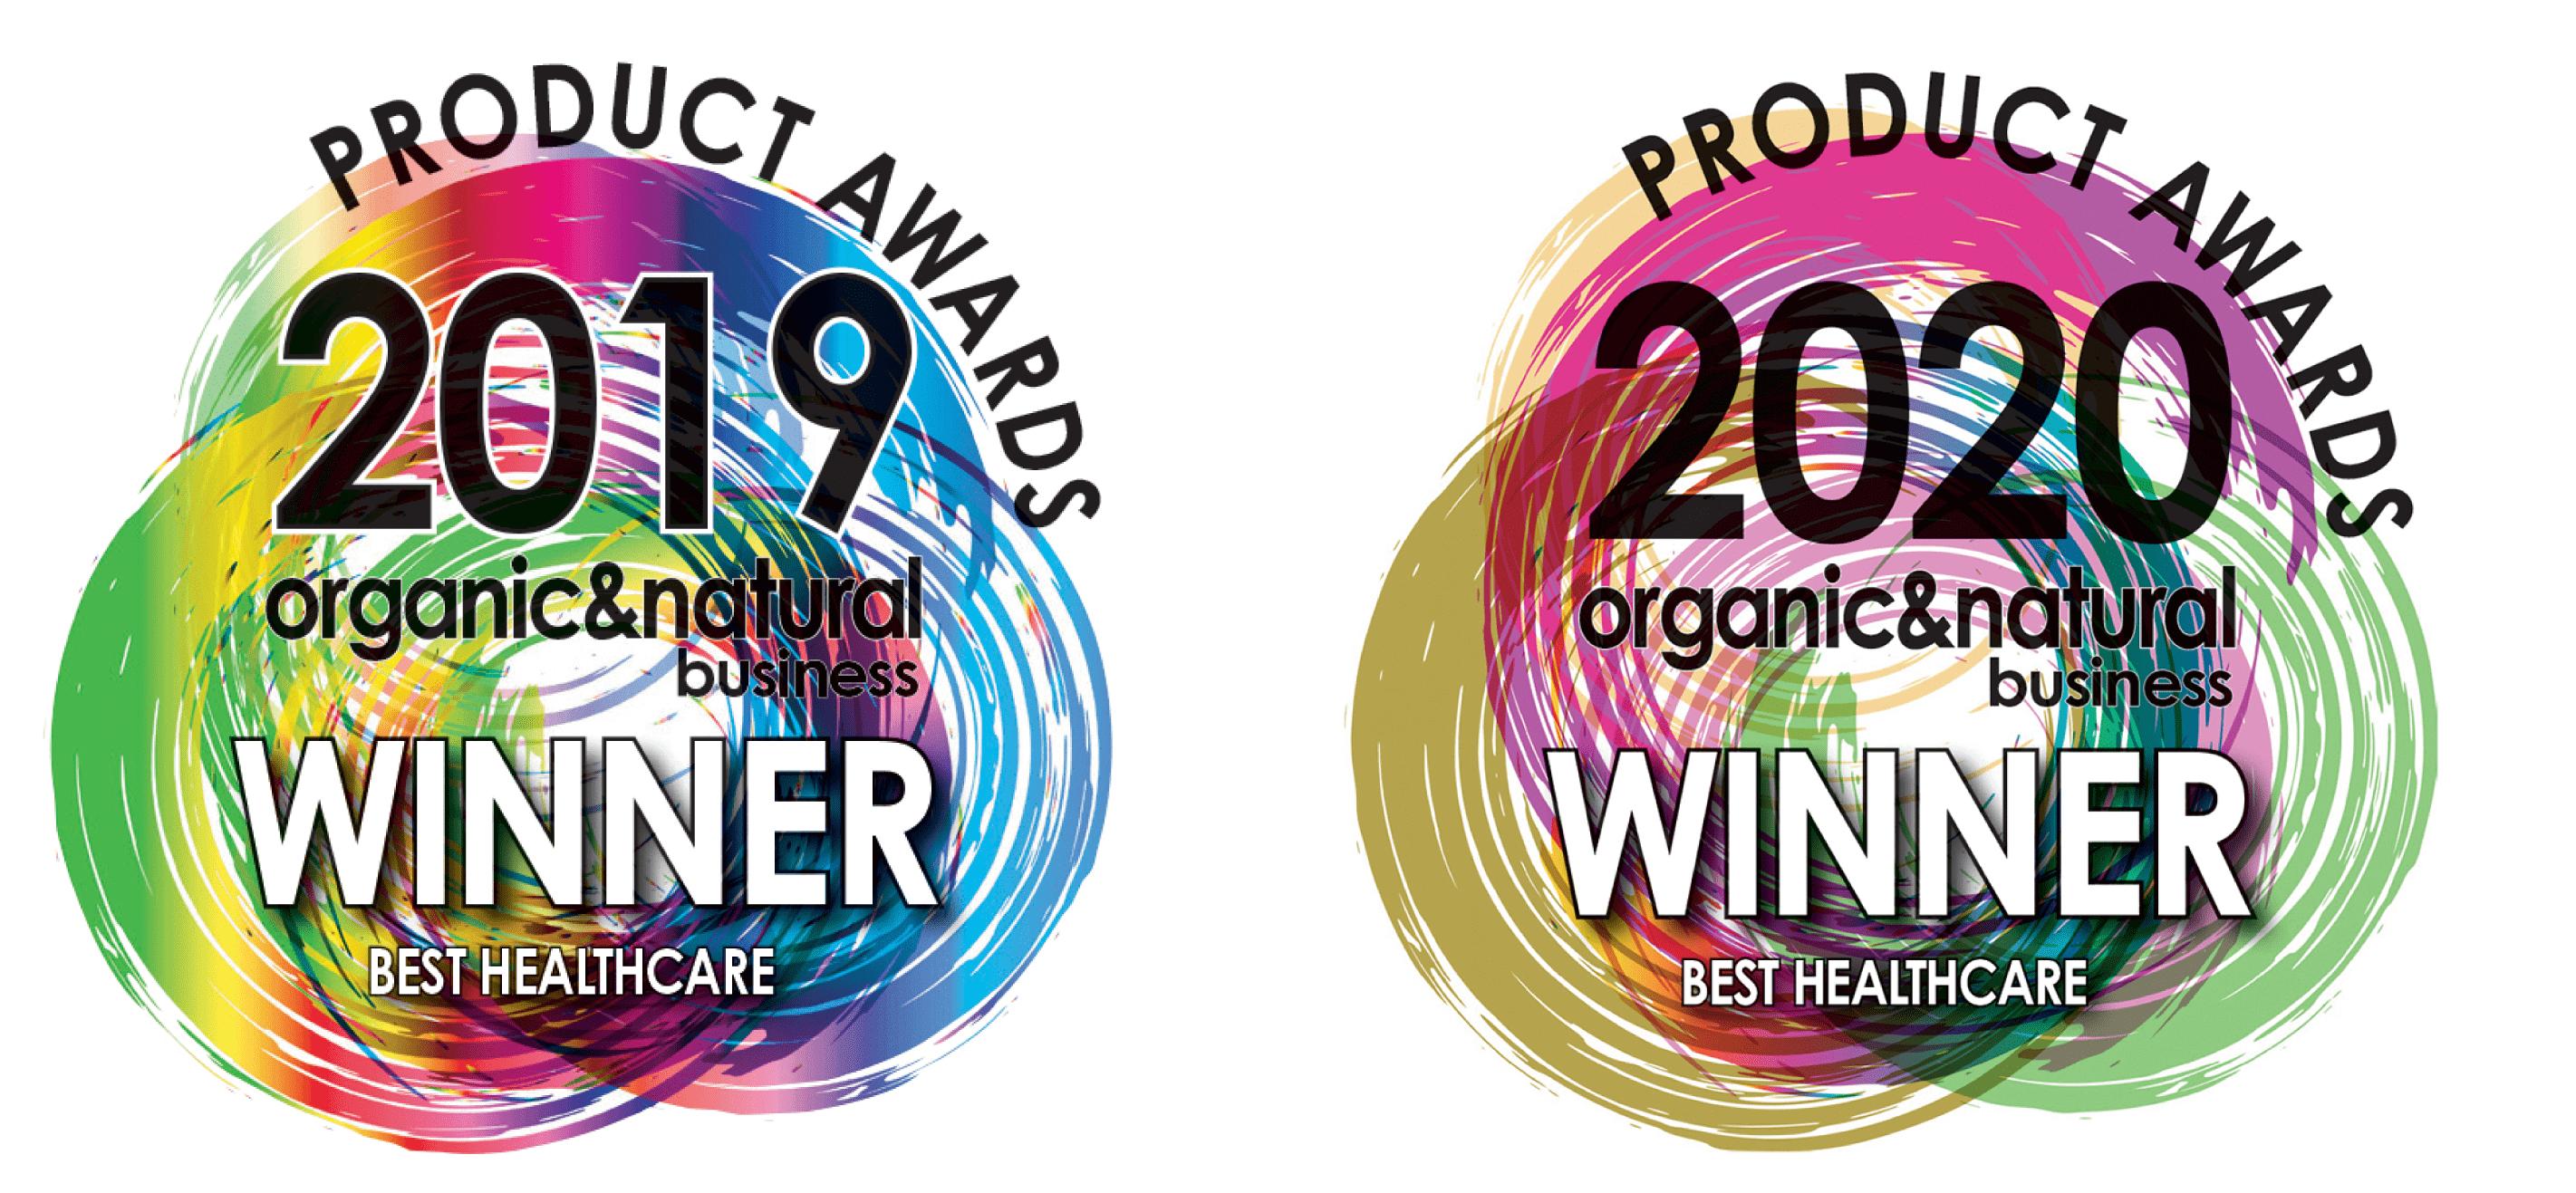 ProductAwards 2019 & 2020